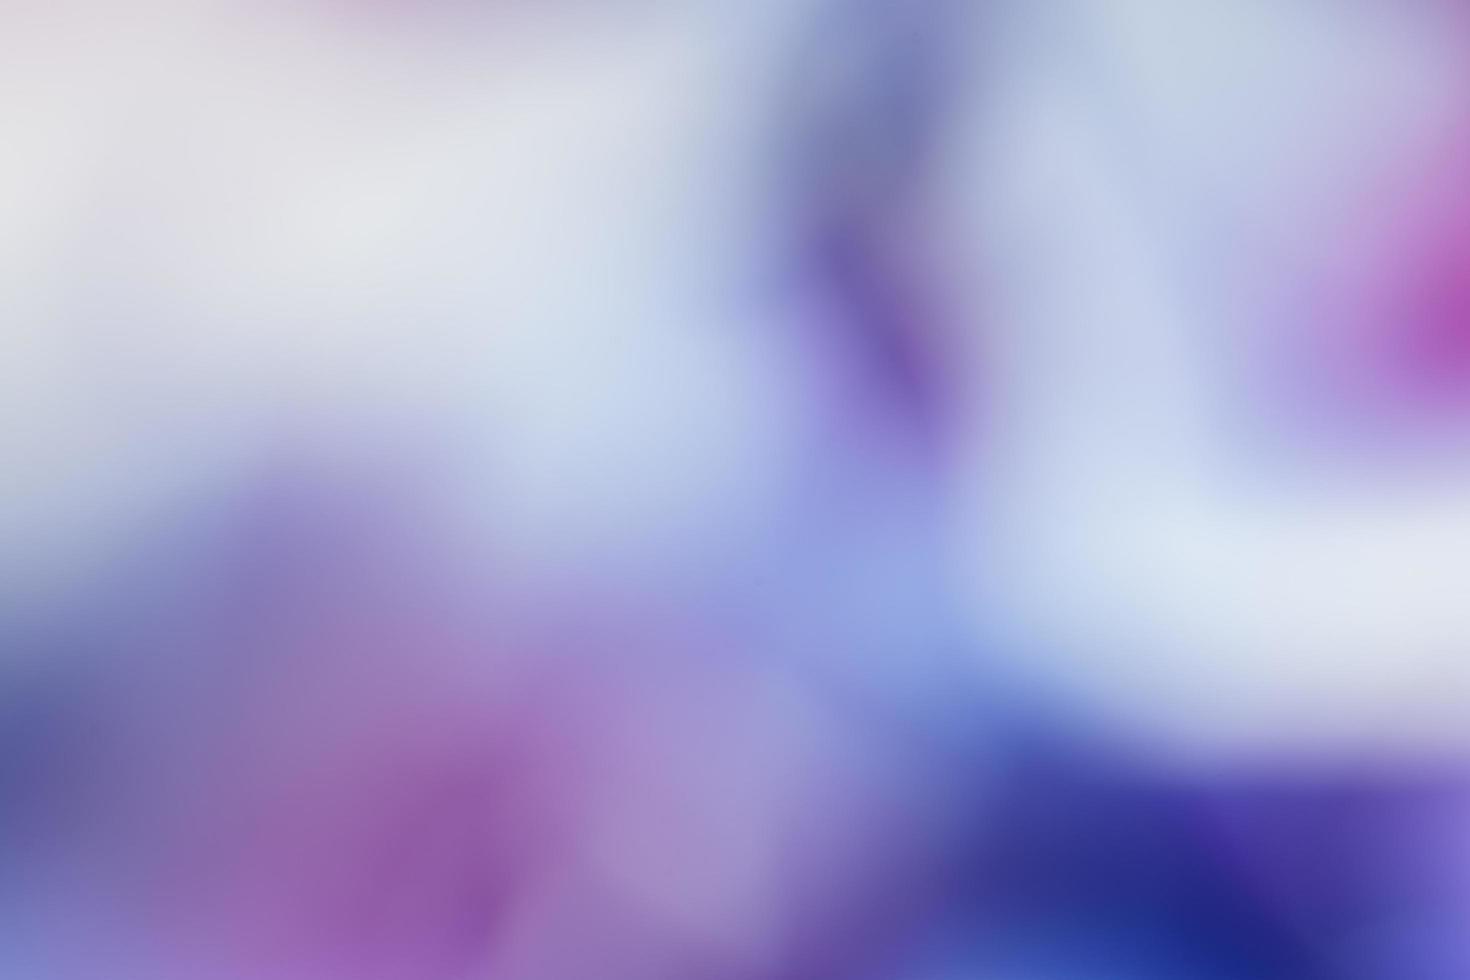 Blurred bokeh background photo